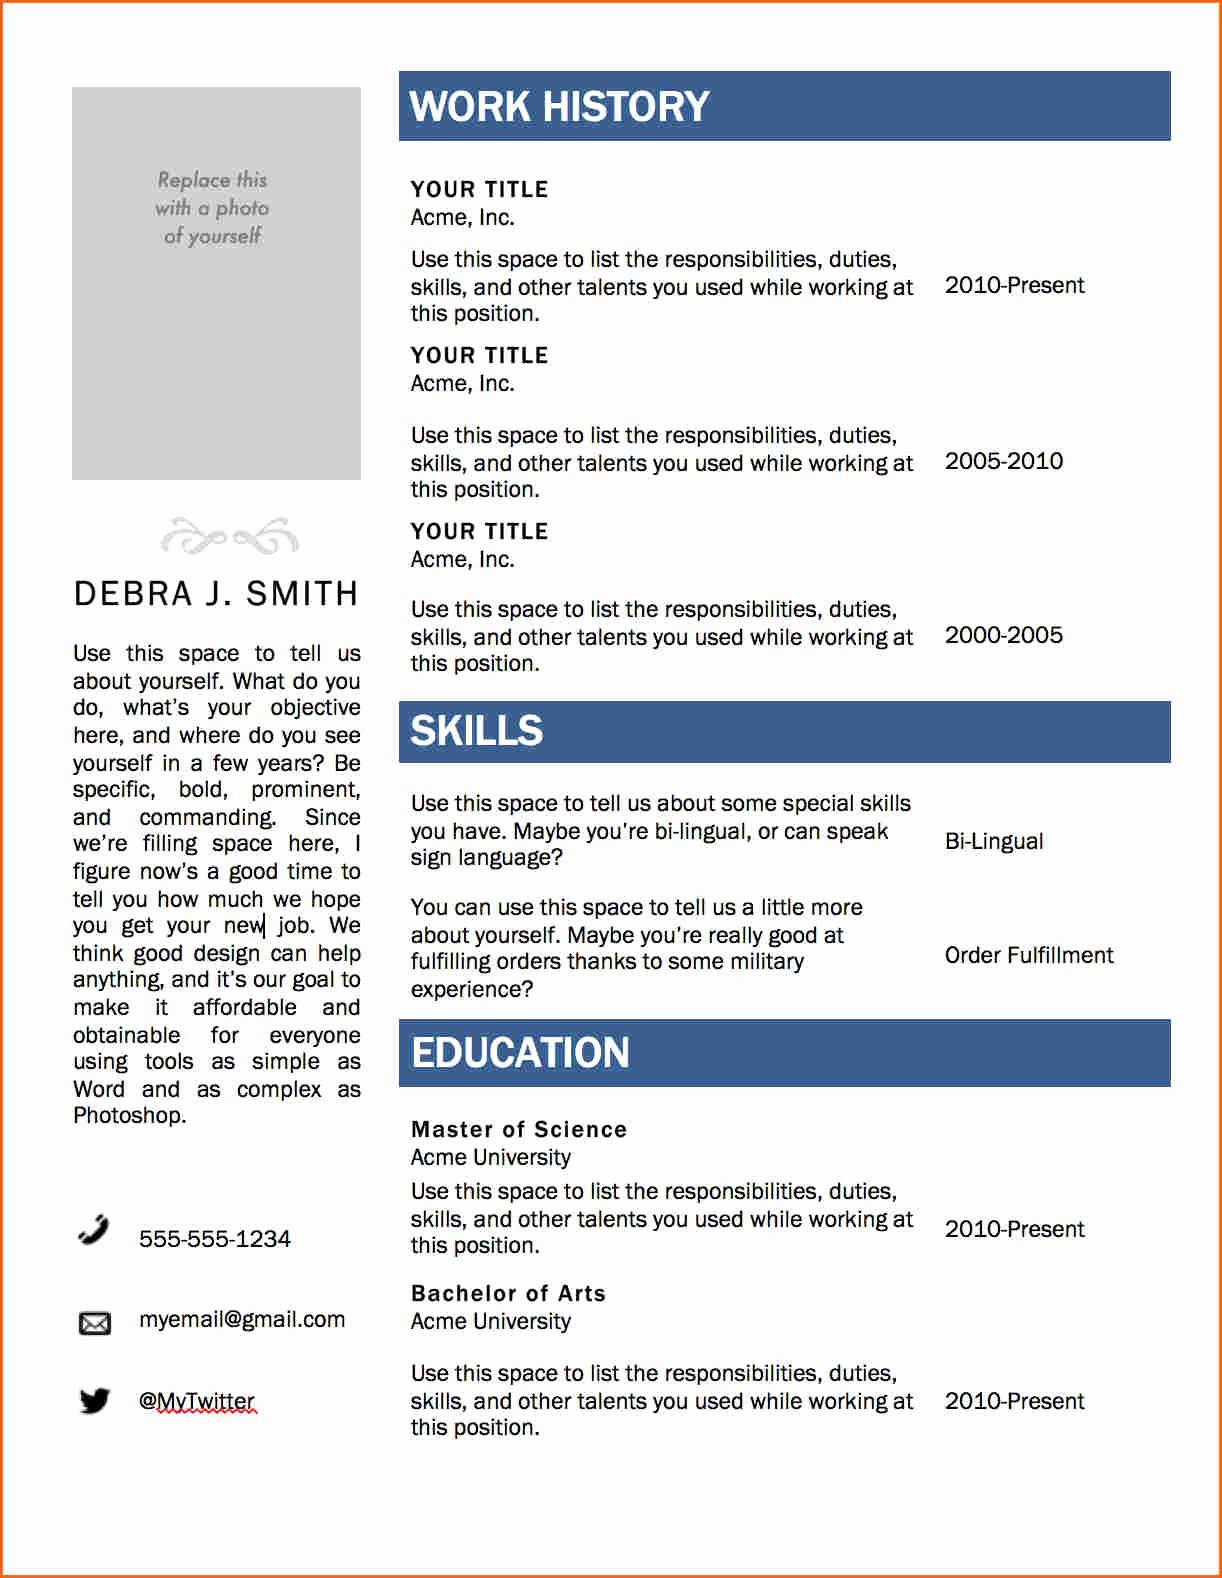 Resume Templates On Word 2007 New 6 Free Resume Templates Microsoft Word 2007 Bud